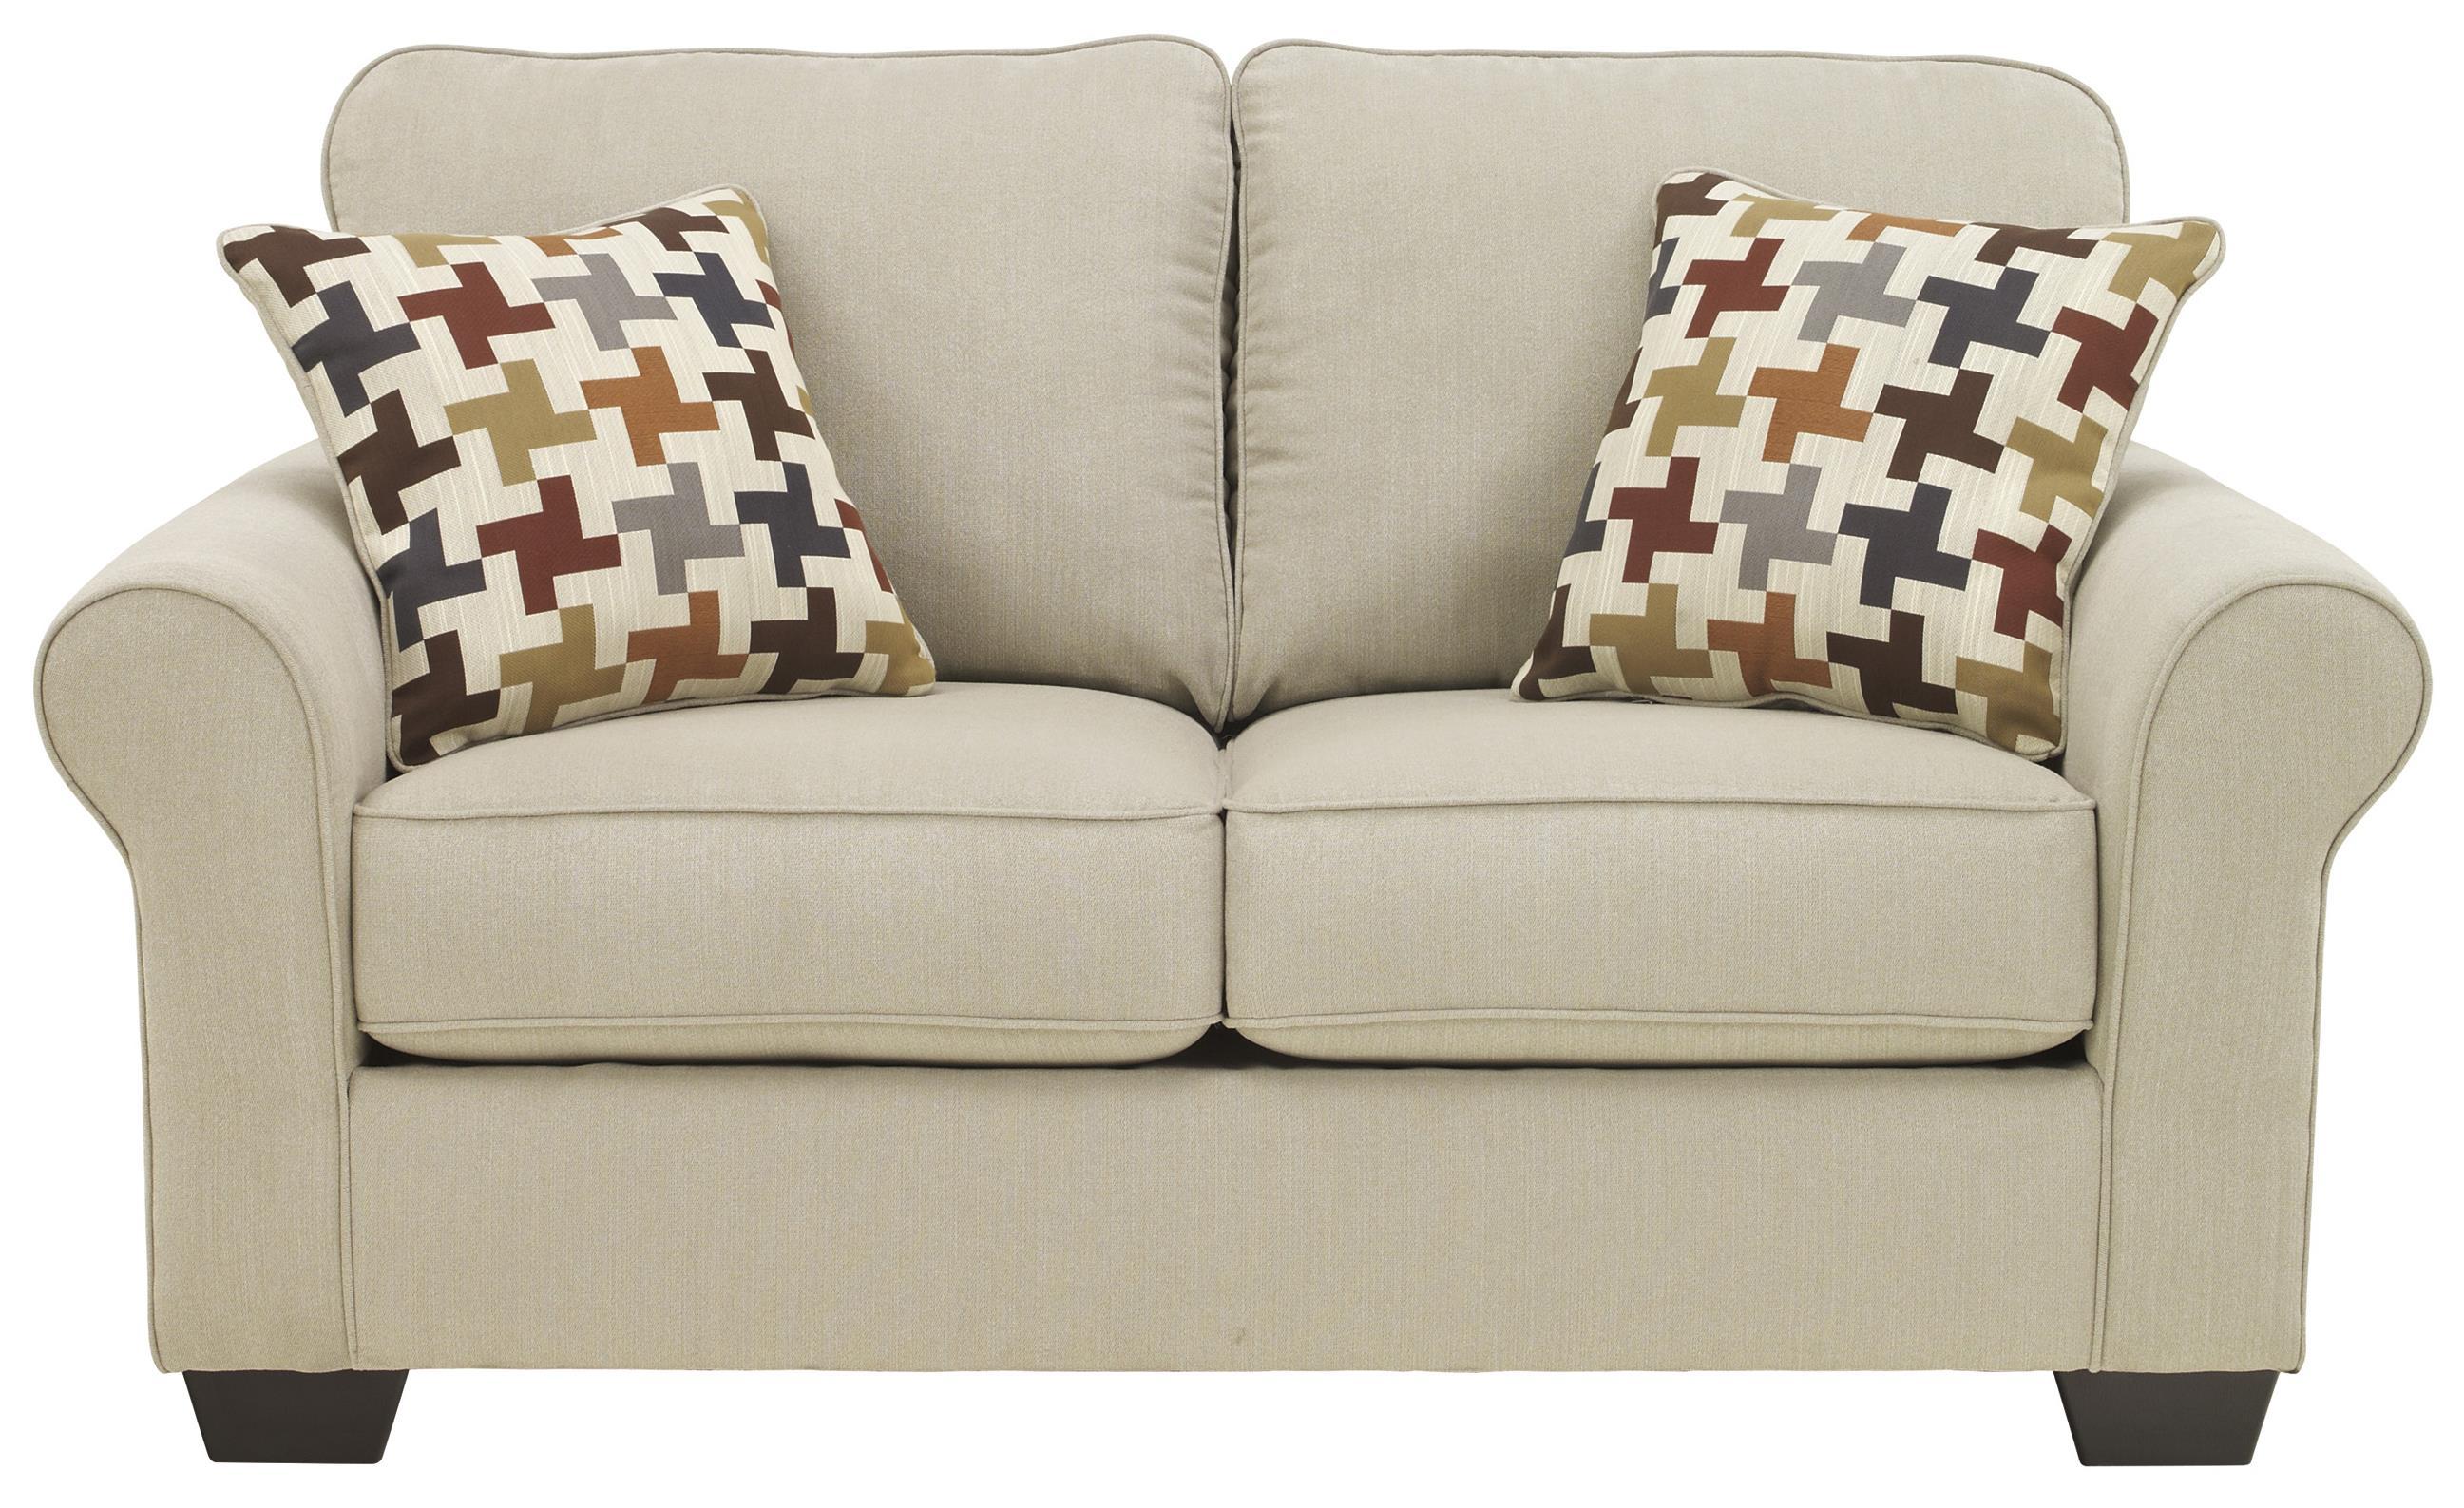 Ashley Furniture Caci Loveseat - Item Number: 8820235